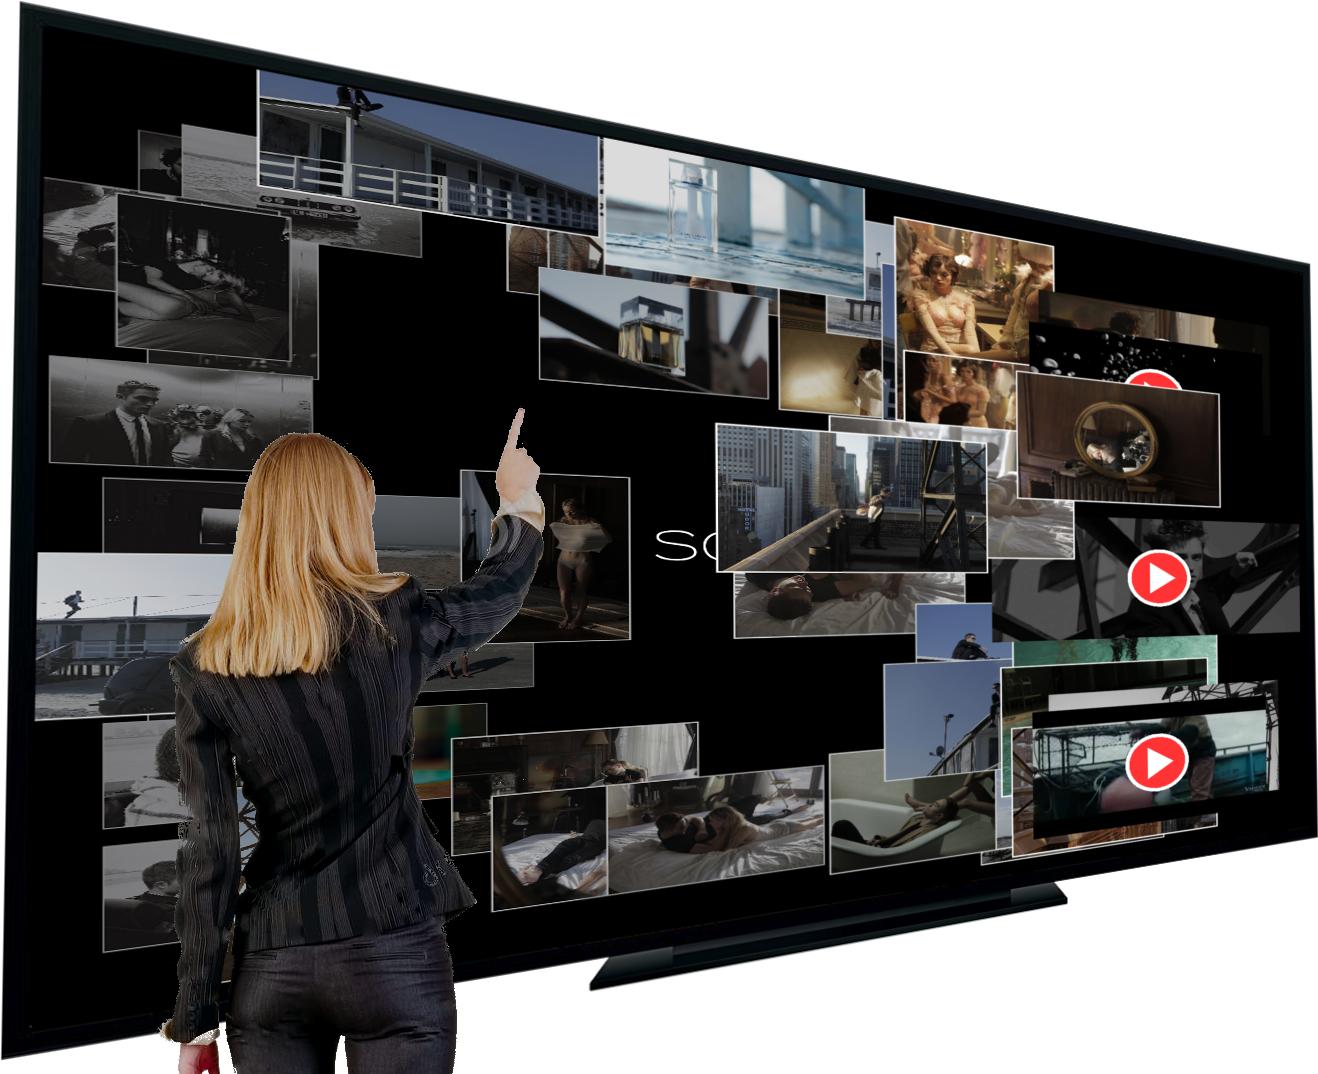 Interactive Wall and Kinect interaction